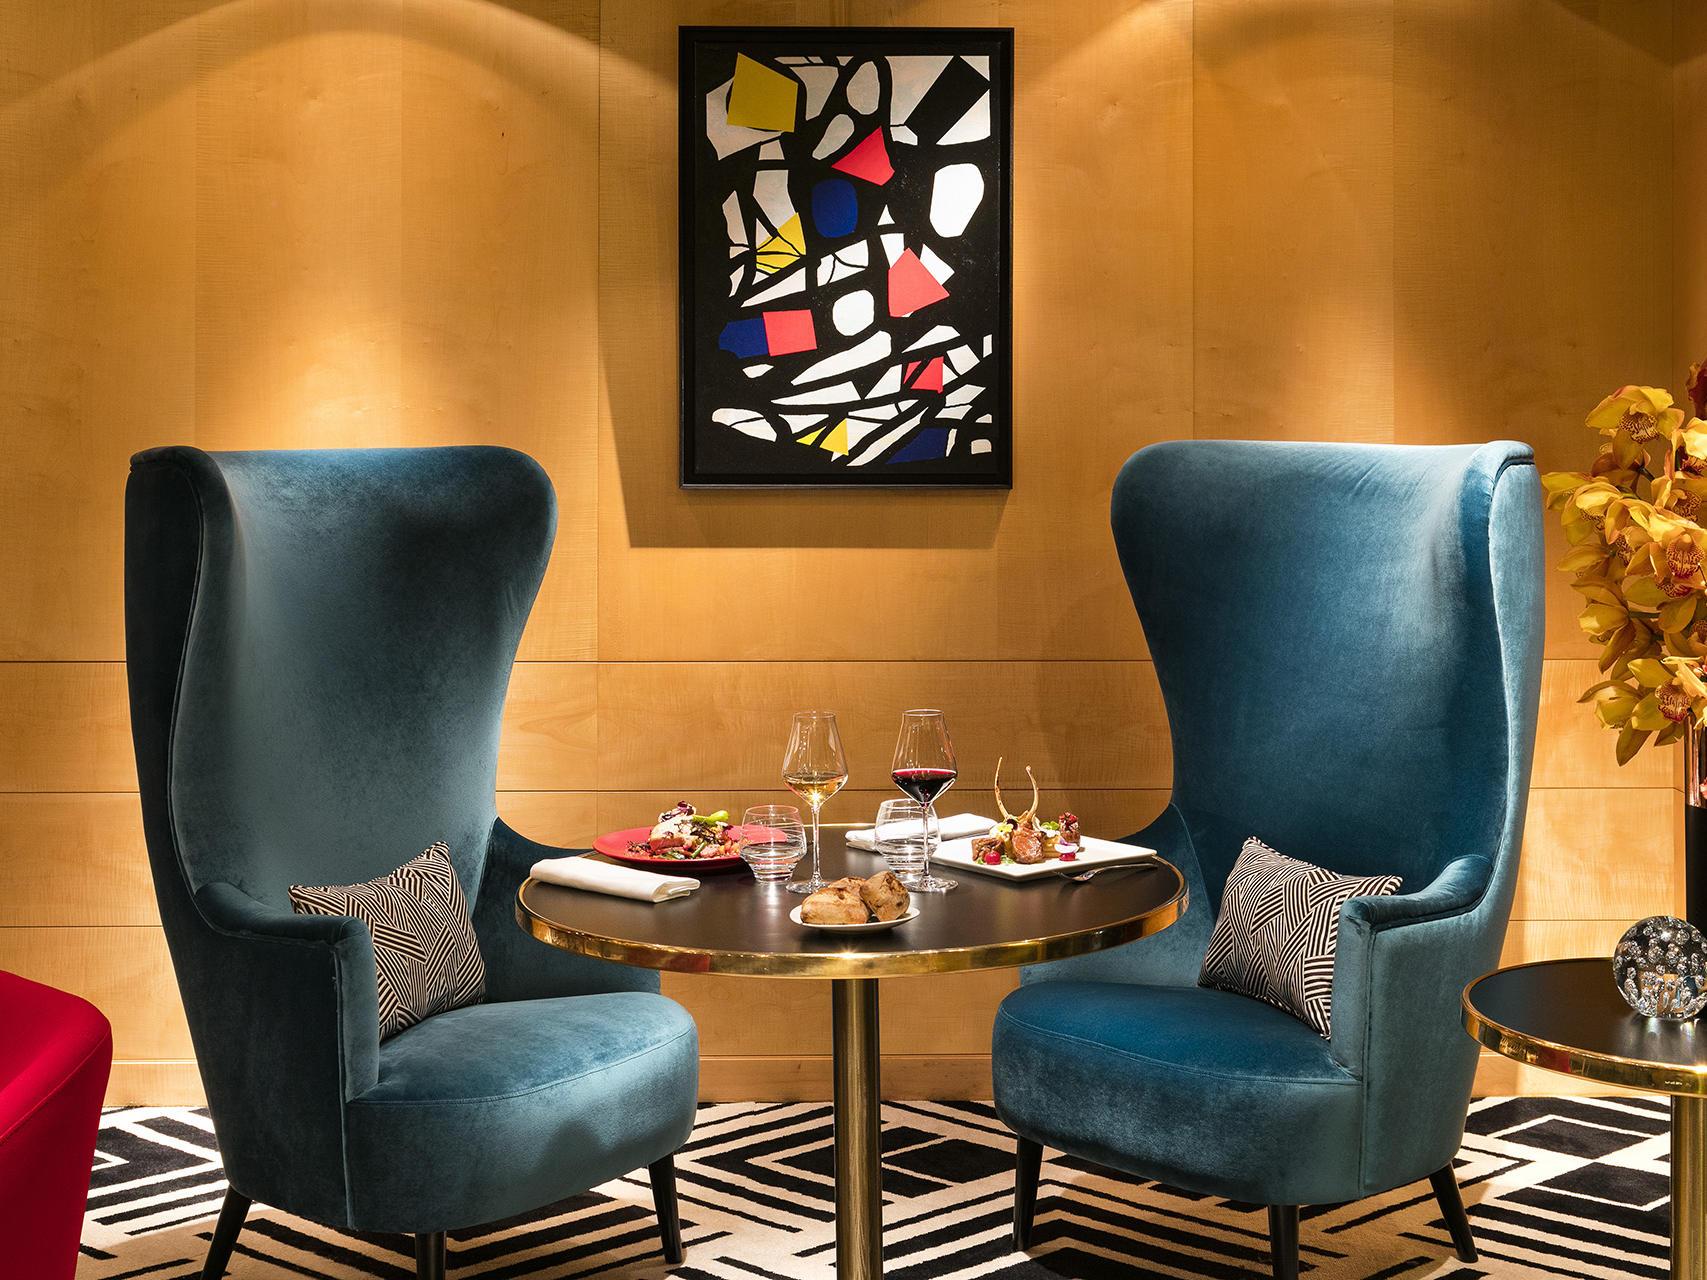 Restaurant Le W Blue Armchairs